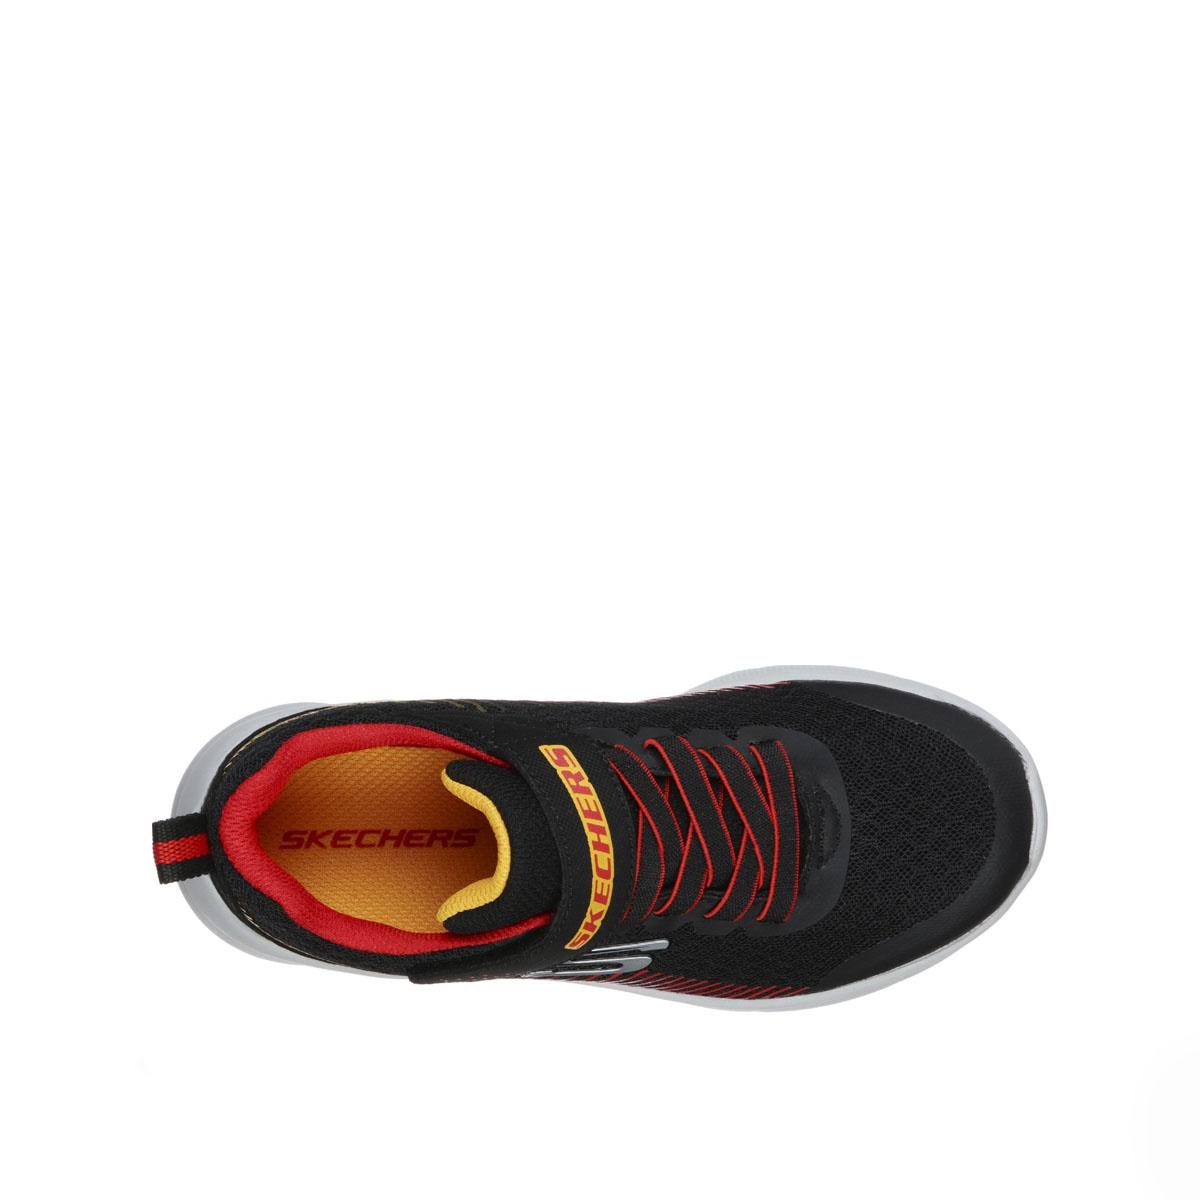 Skechers Gorza Black Red